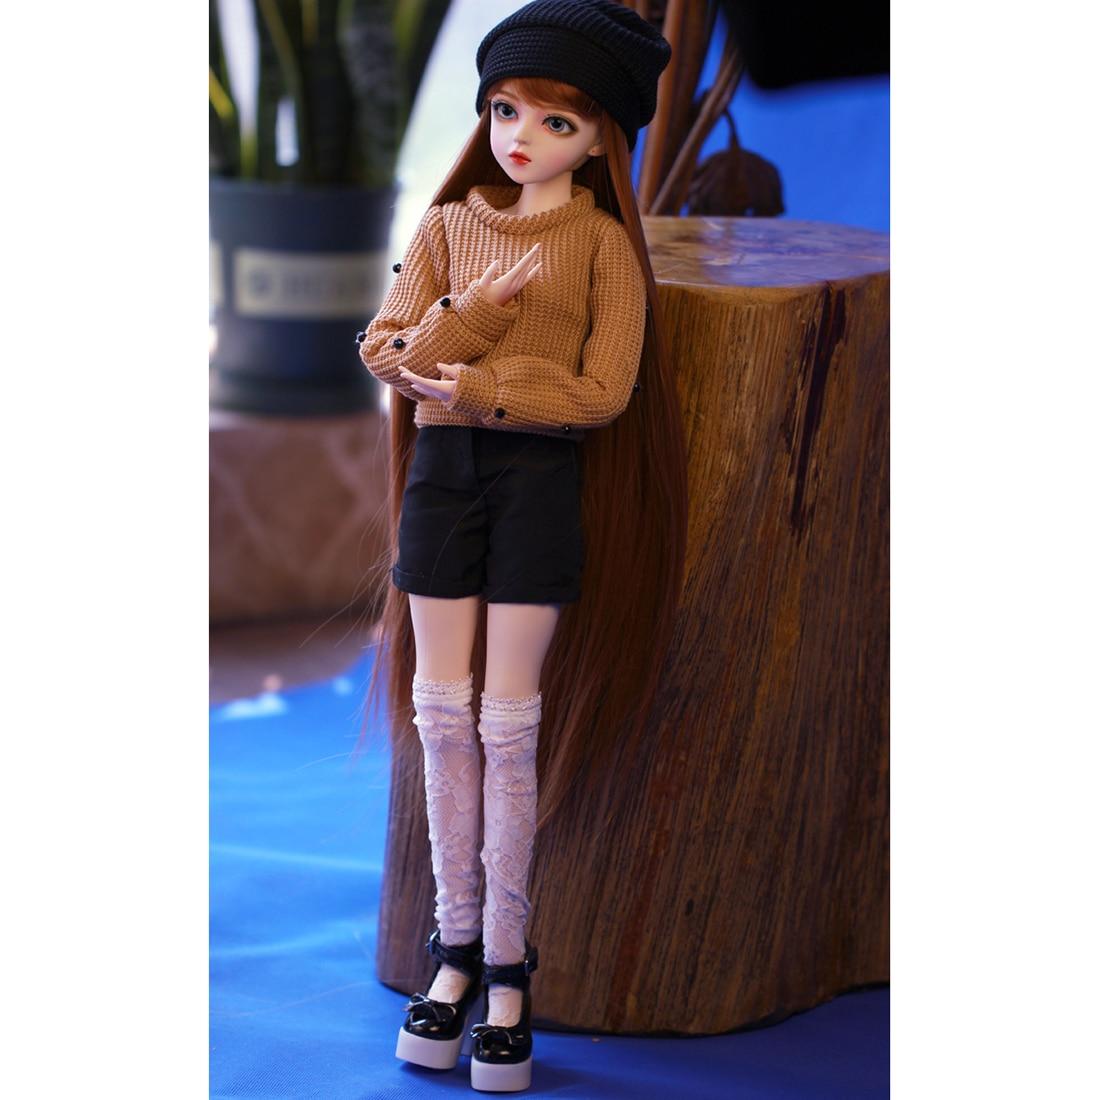 60cm 1/3 BJD Dolls Mechanical Joints Princess Doll Set - Kaka (Included Eyes + Handmade Makeup + Full Clothes As Shown)